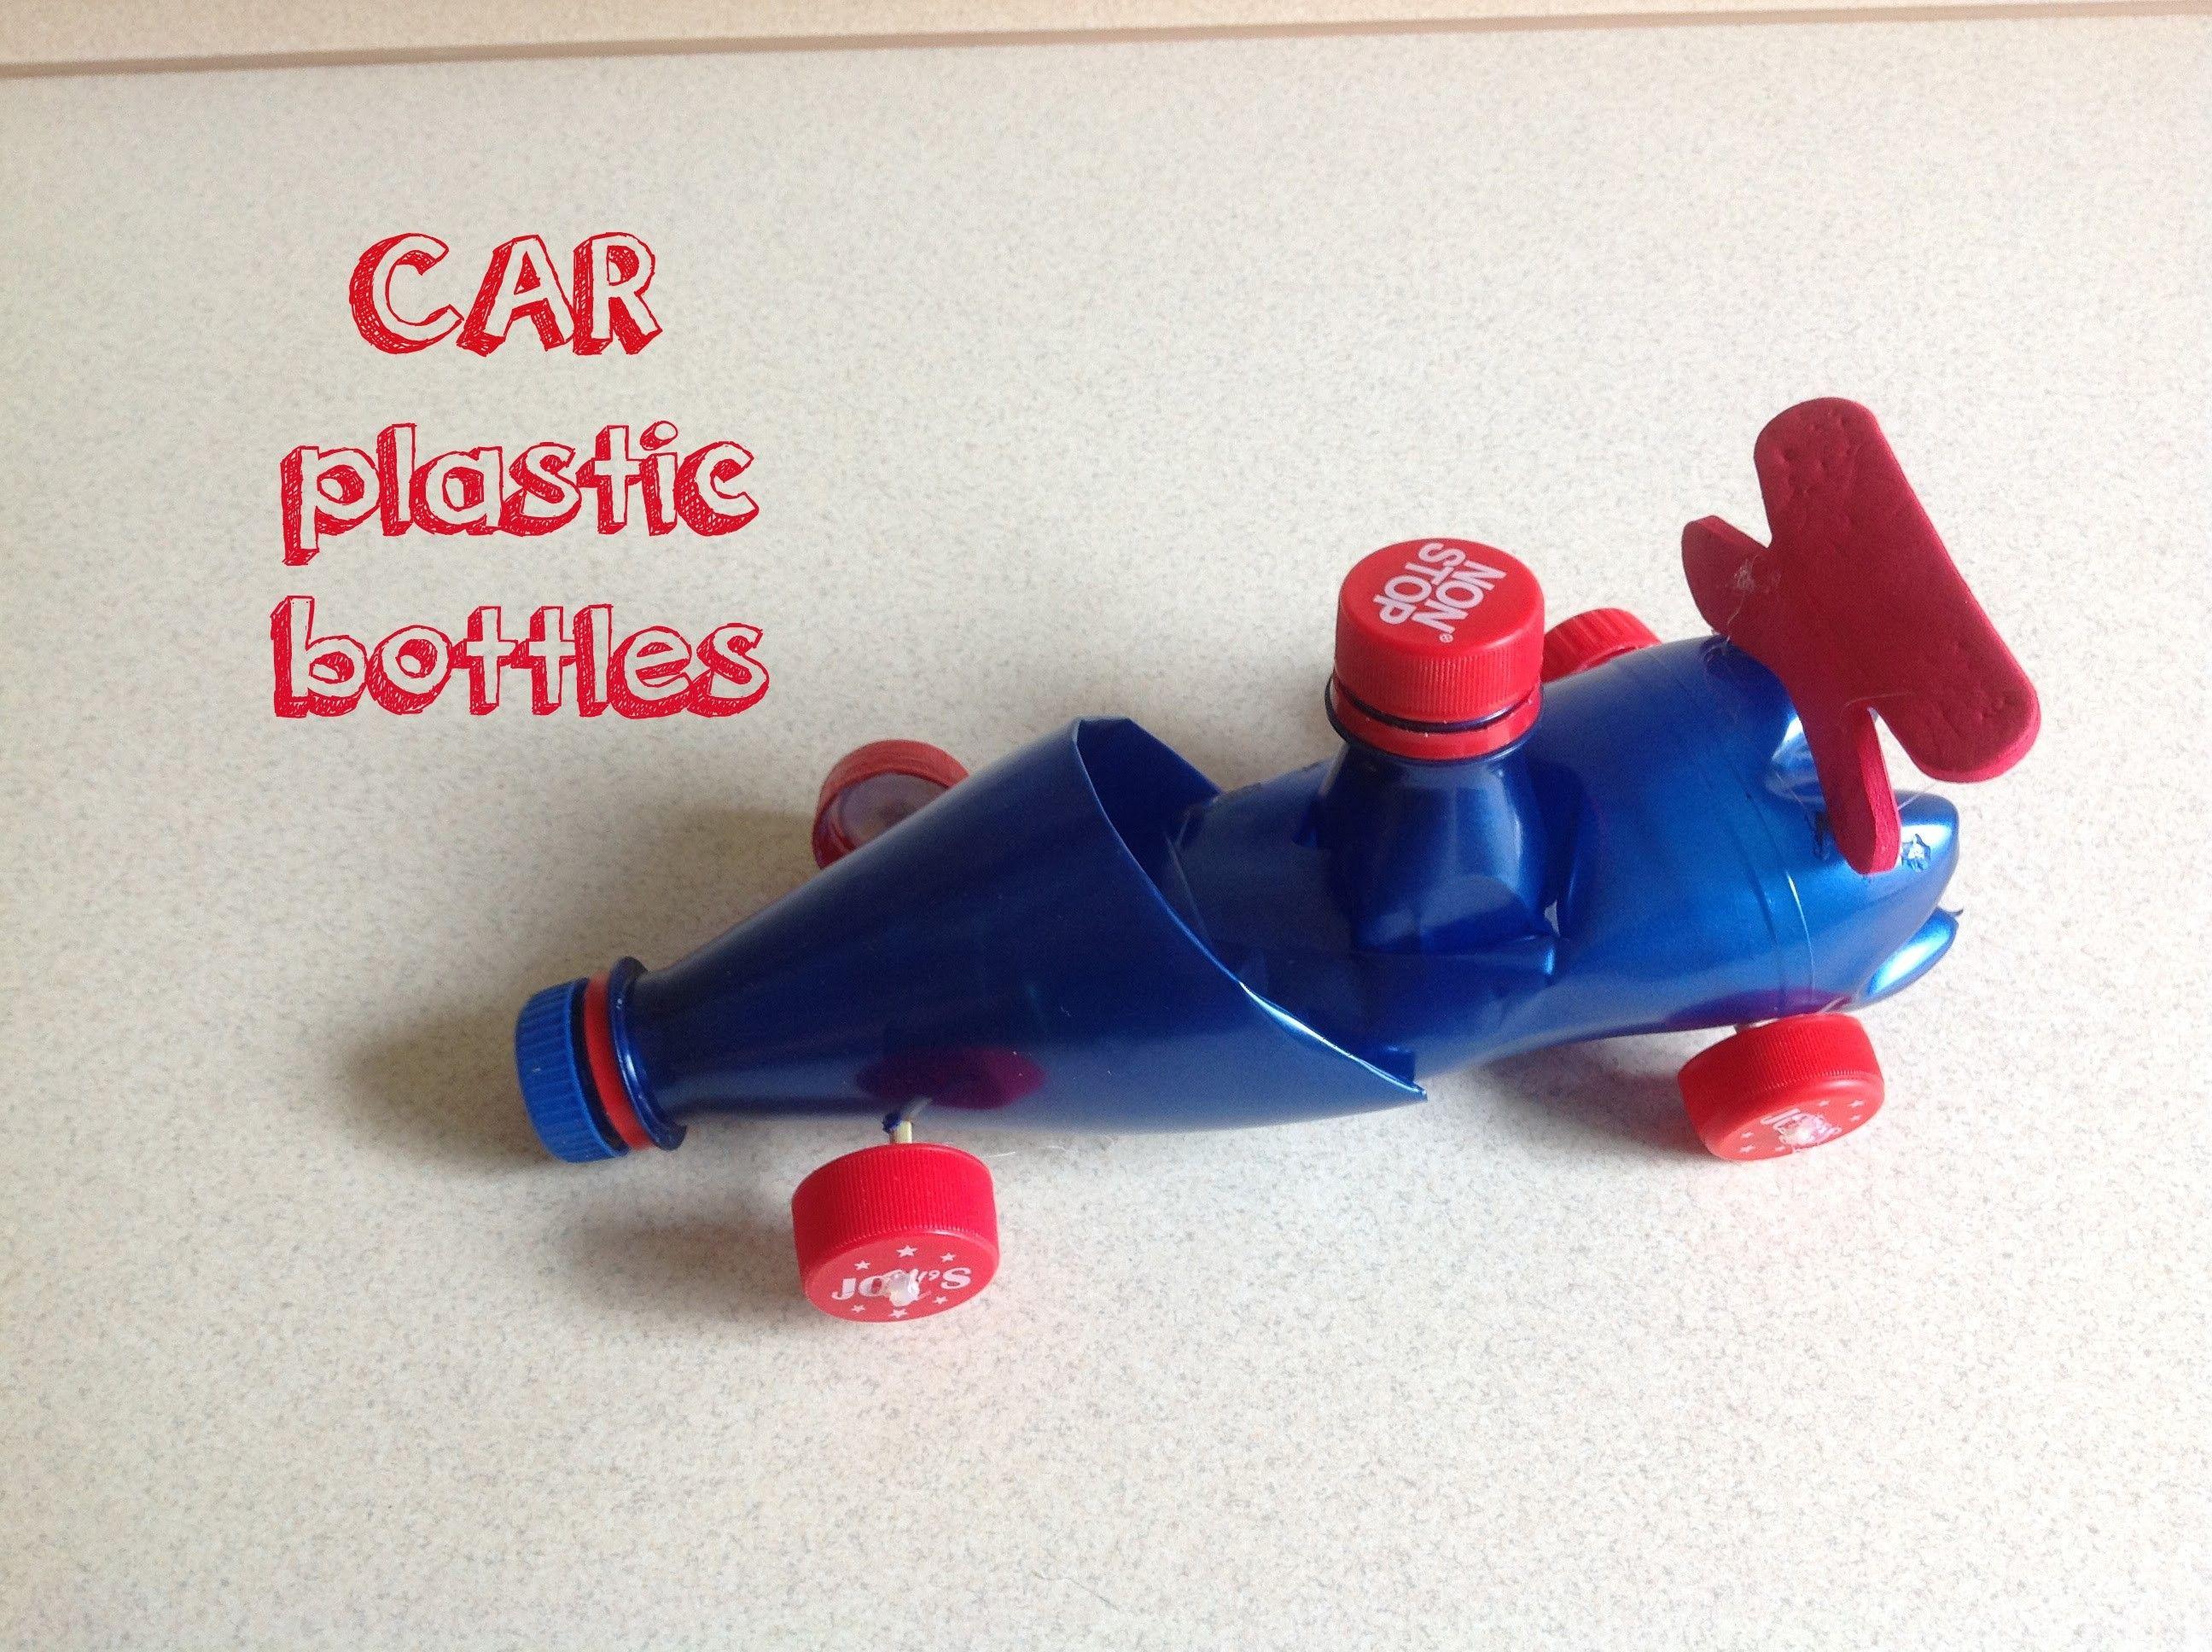 Toys car image  Racing car Toy DIY Plastic bottles Creative ideas  toys to make